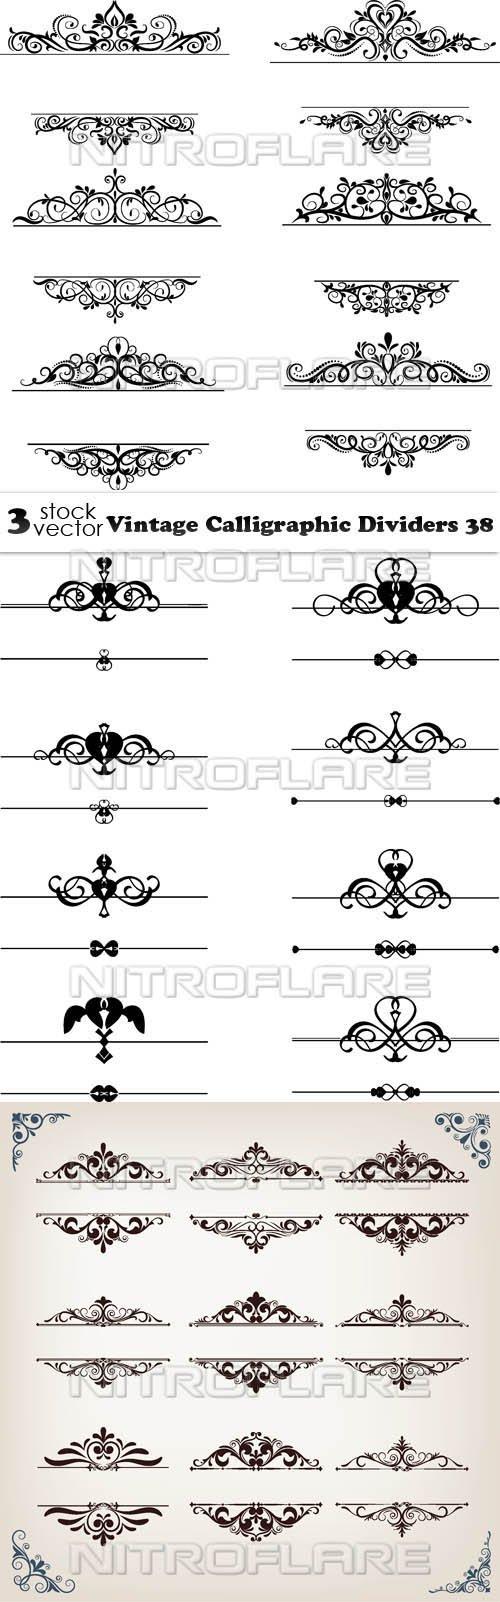 Vectors - Vintage Calligraphic Dividers 38